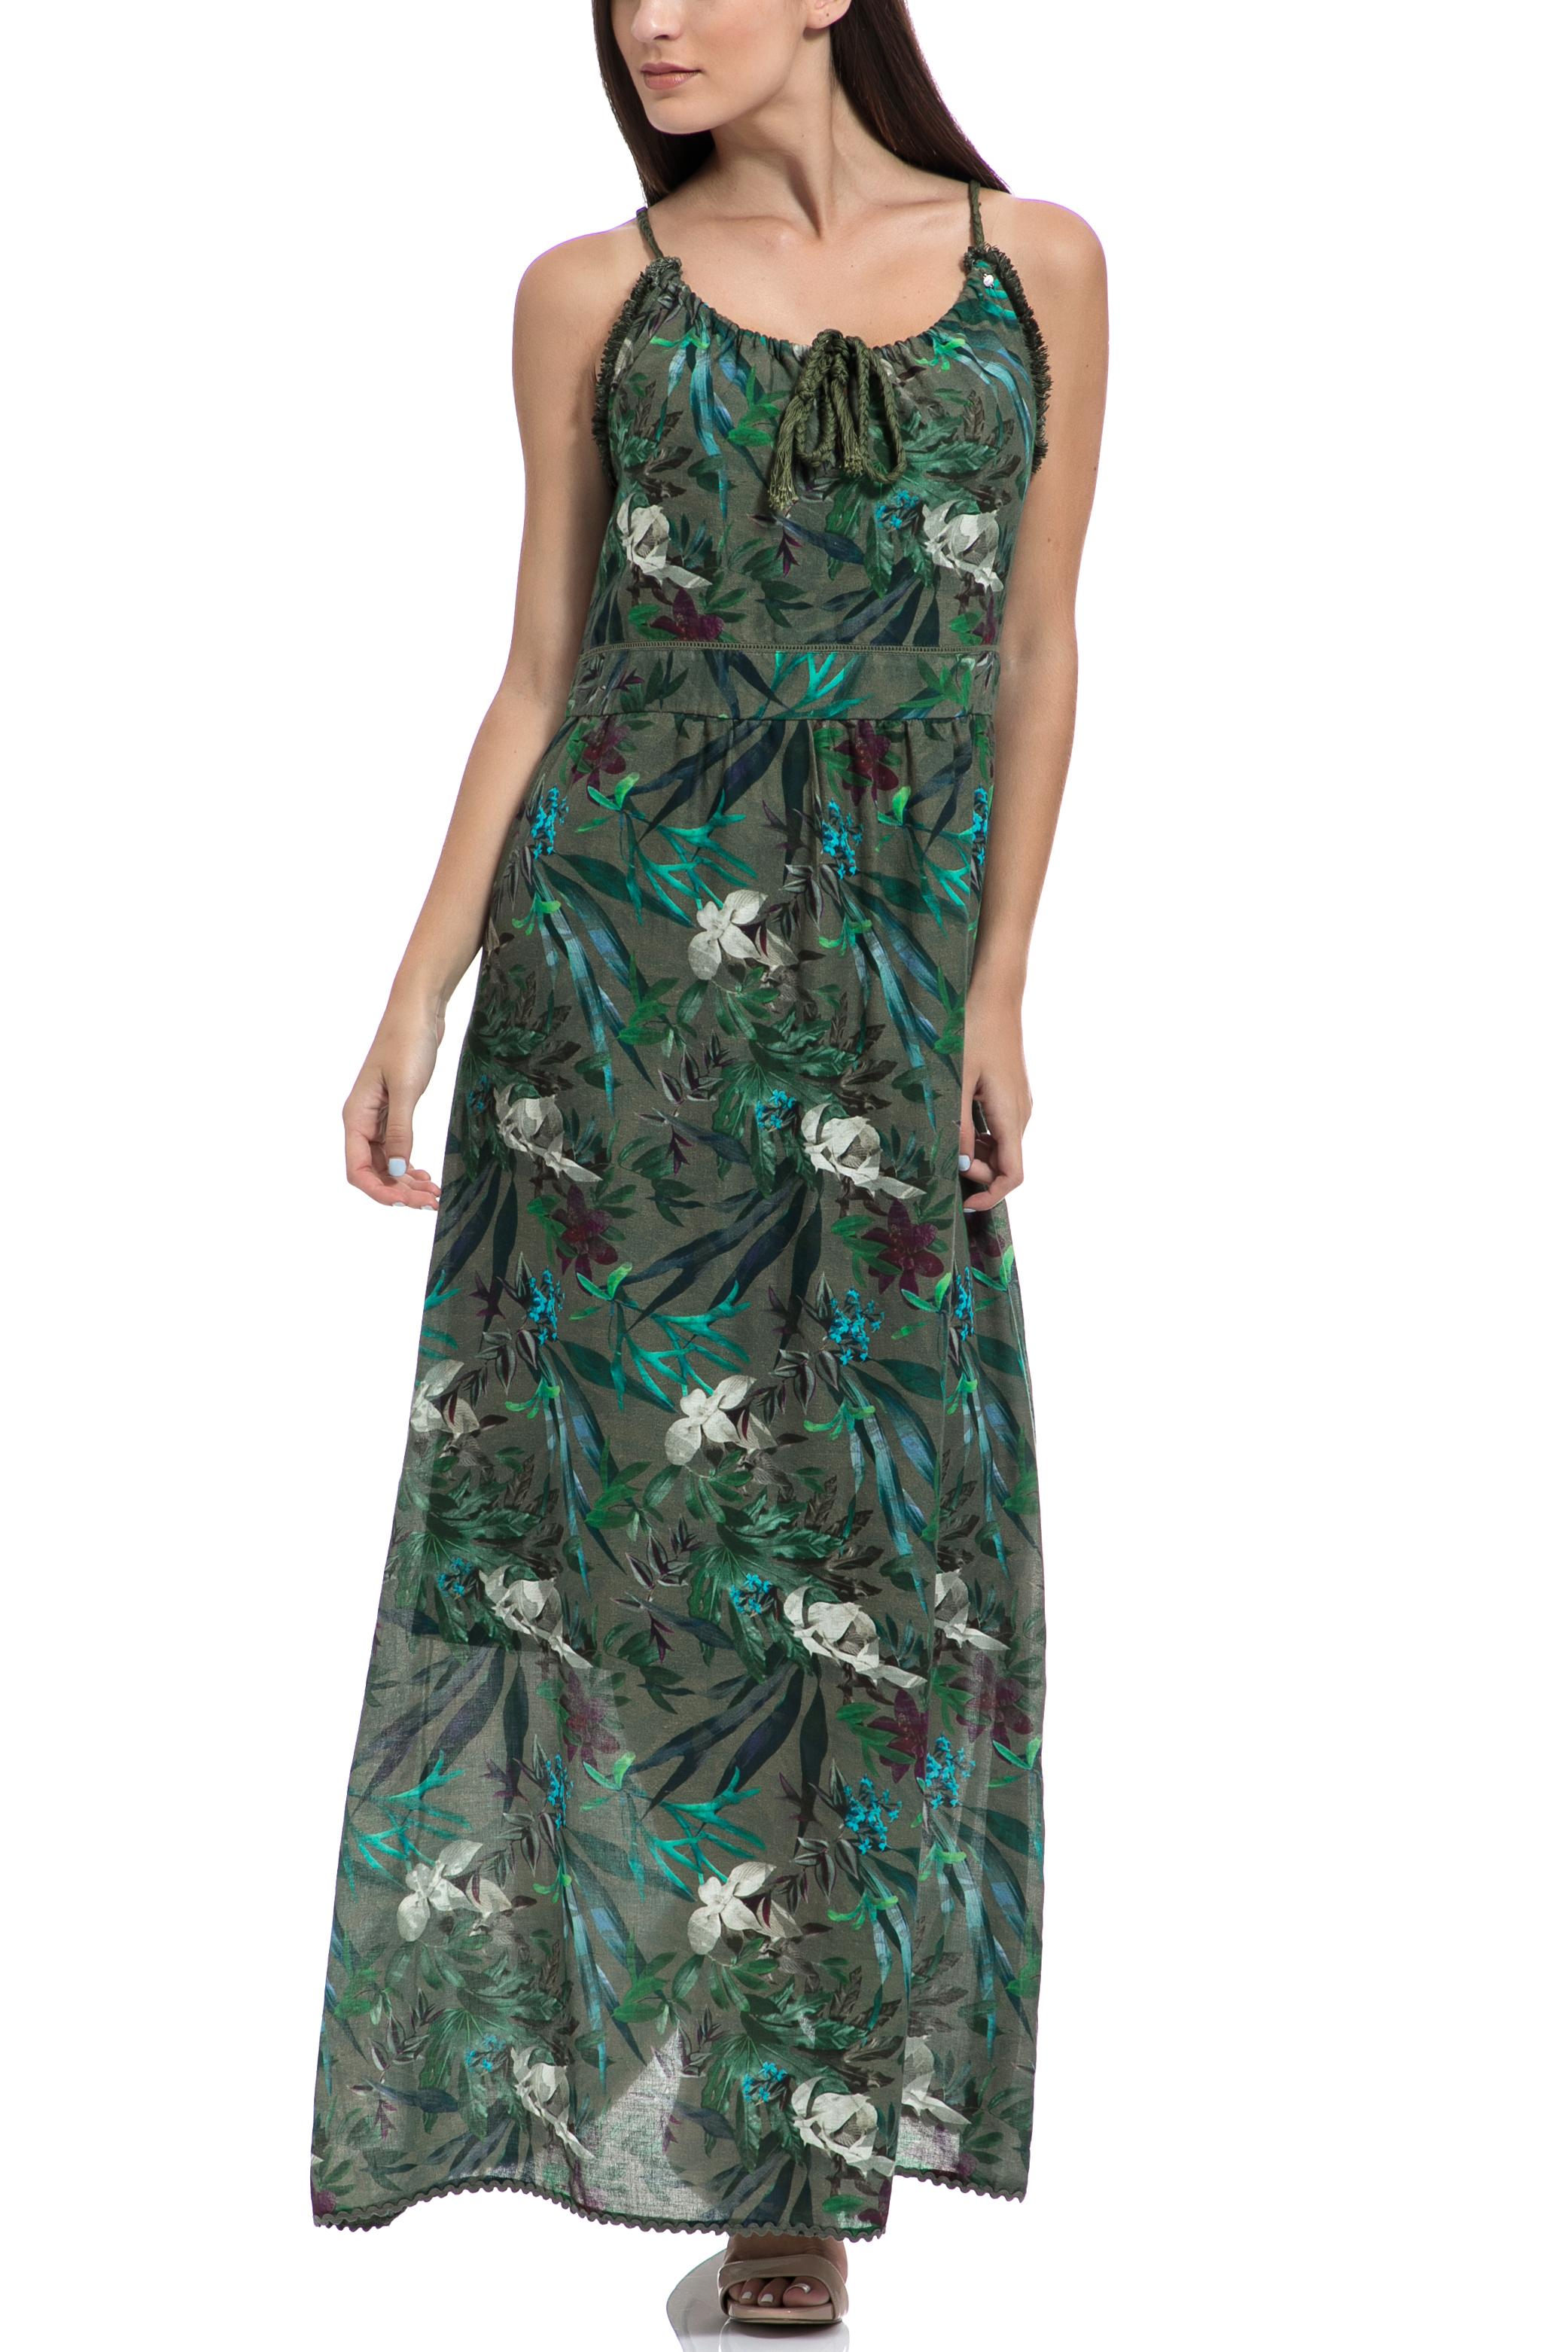 GAS - Γυναικείο φόρεμα VESTITI MELODYC πράσινο γυναικεία ρούχα φορέματα μάξι